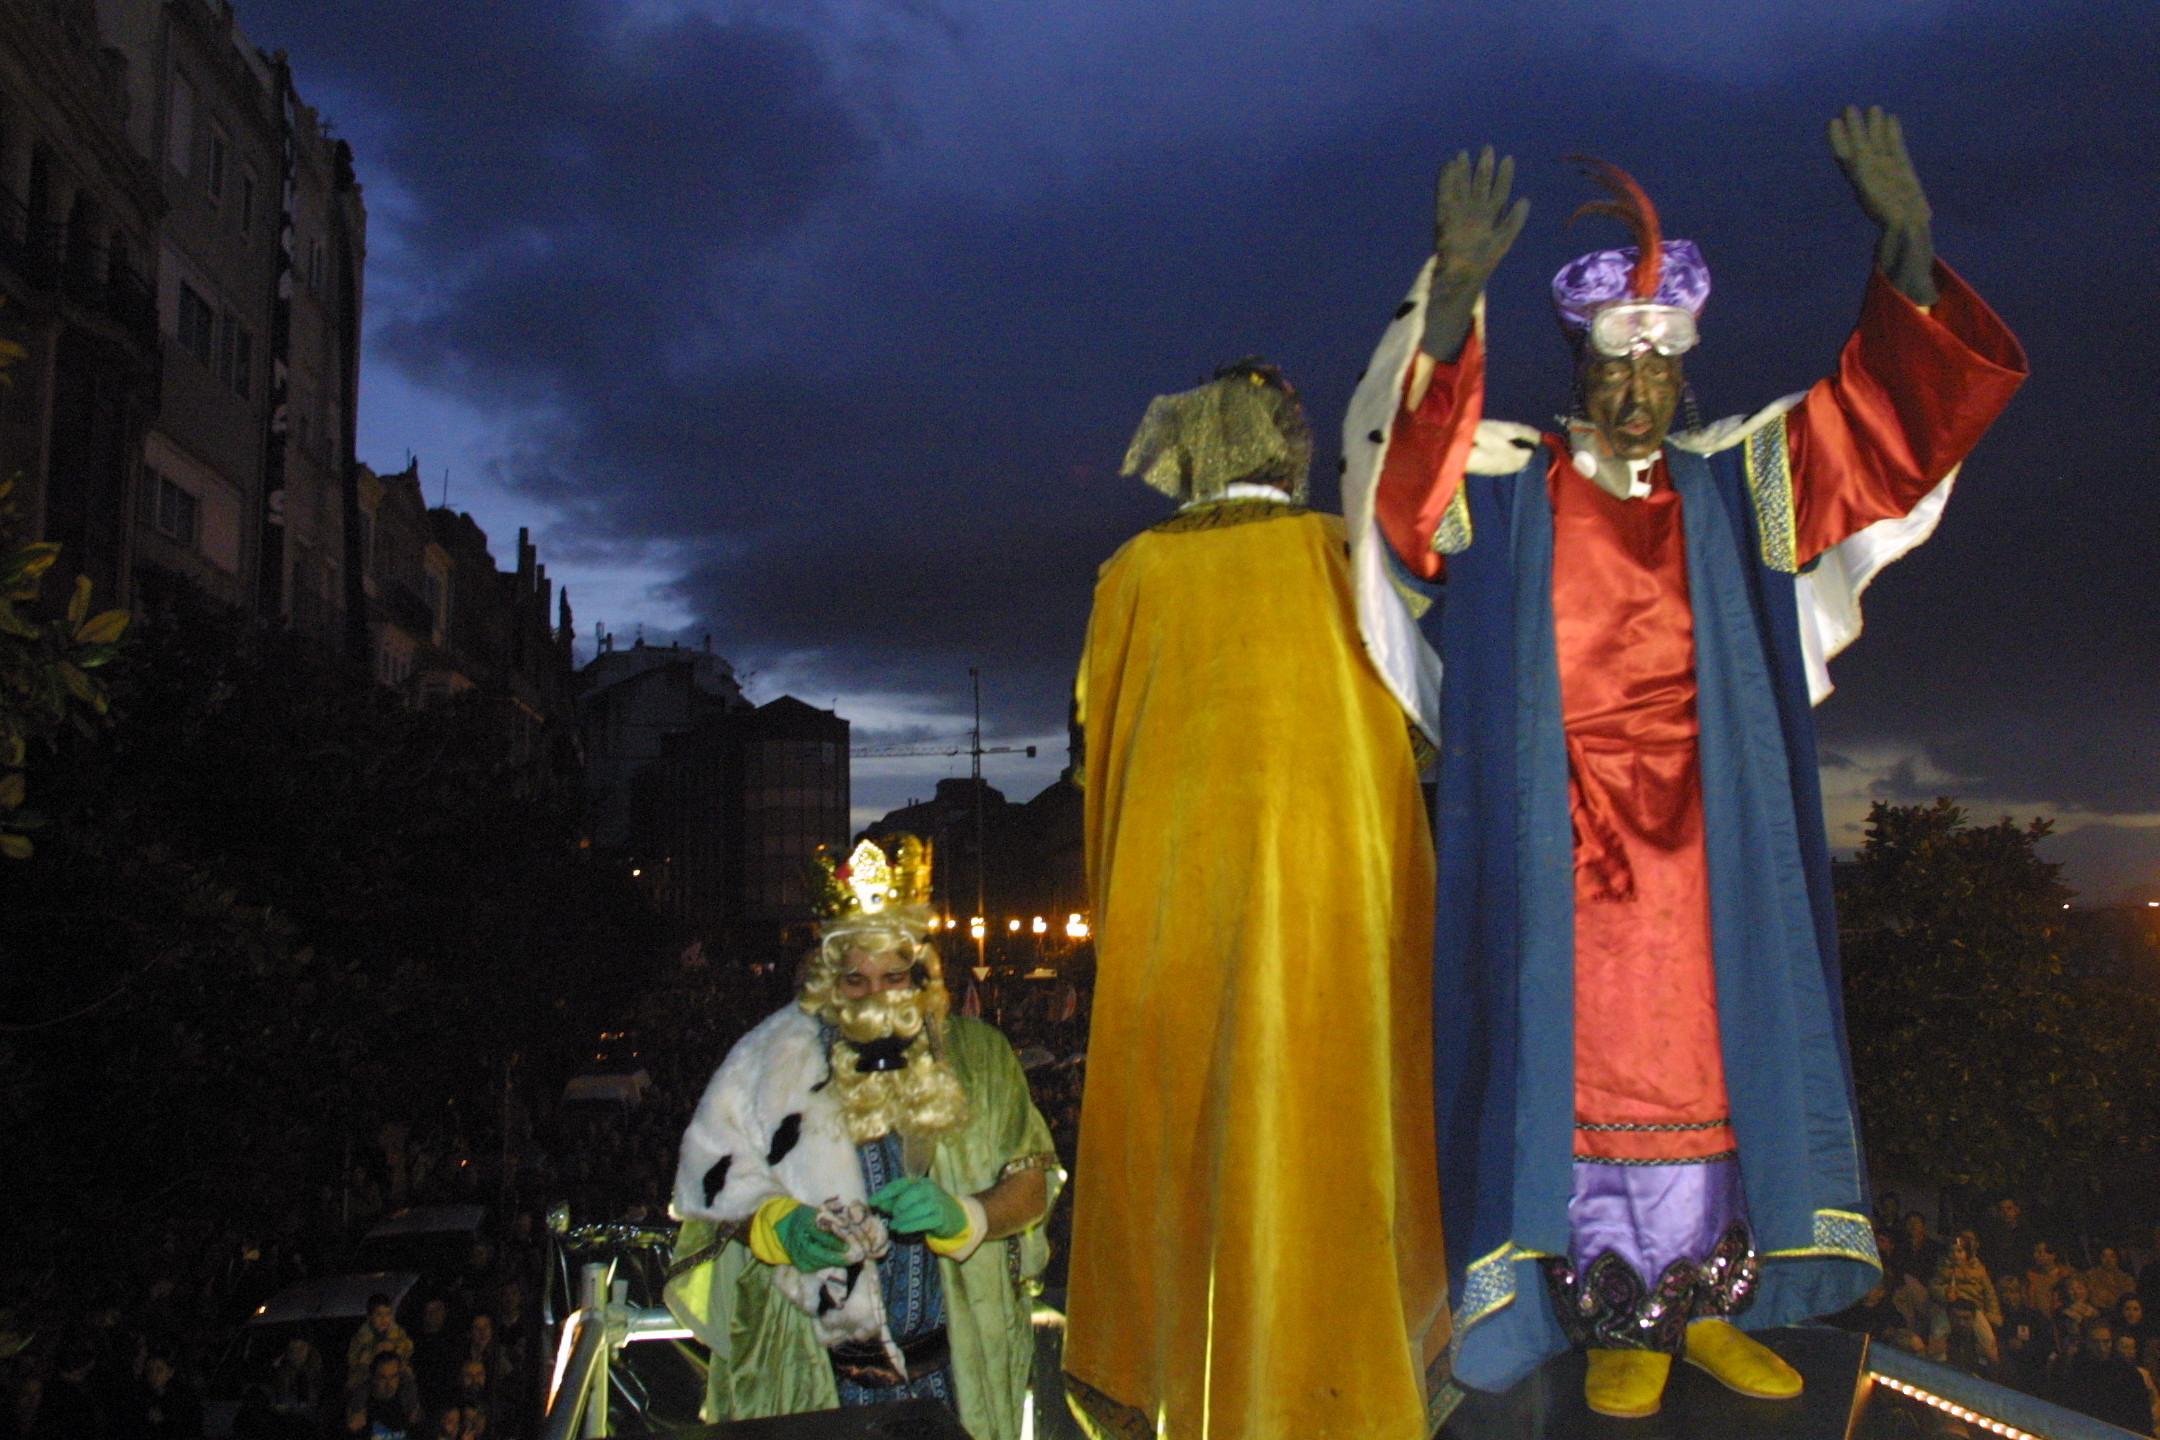 Burla Negra organiza un acto de protesta por las calles de Vigo <br>Capotillo